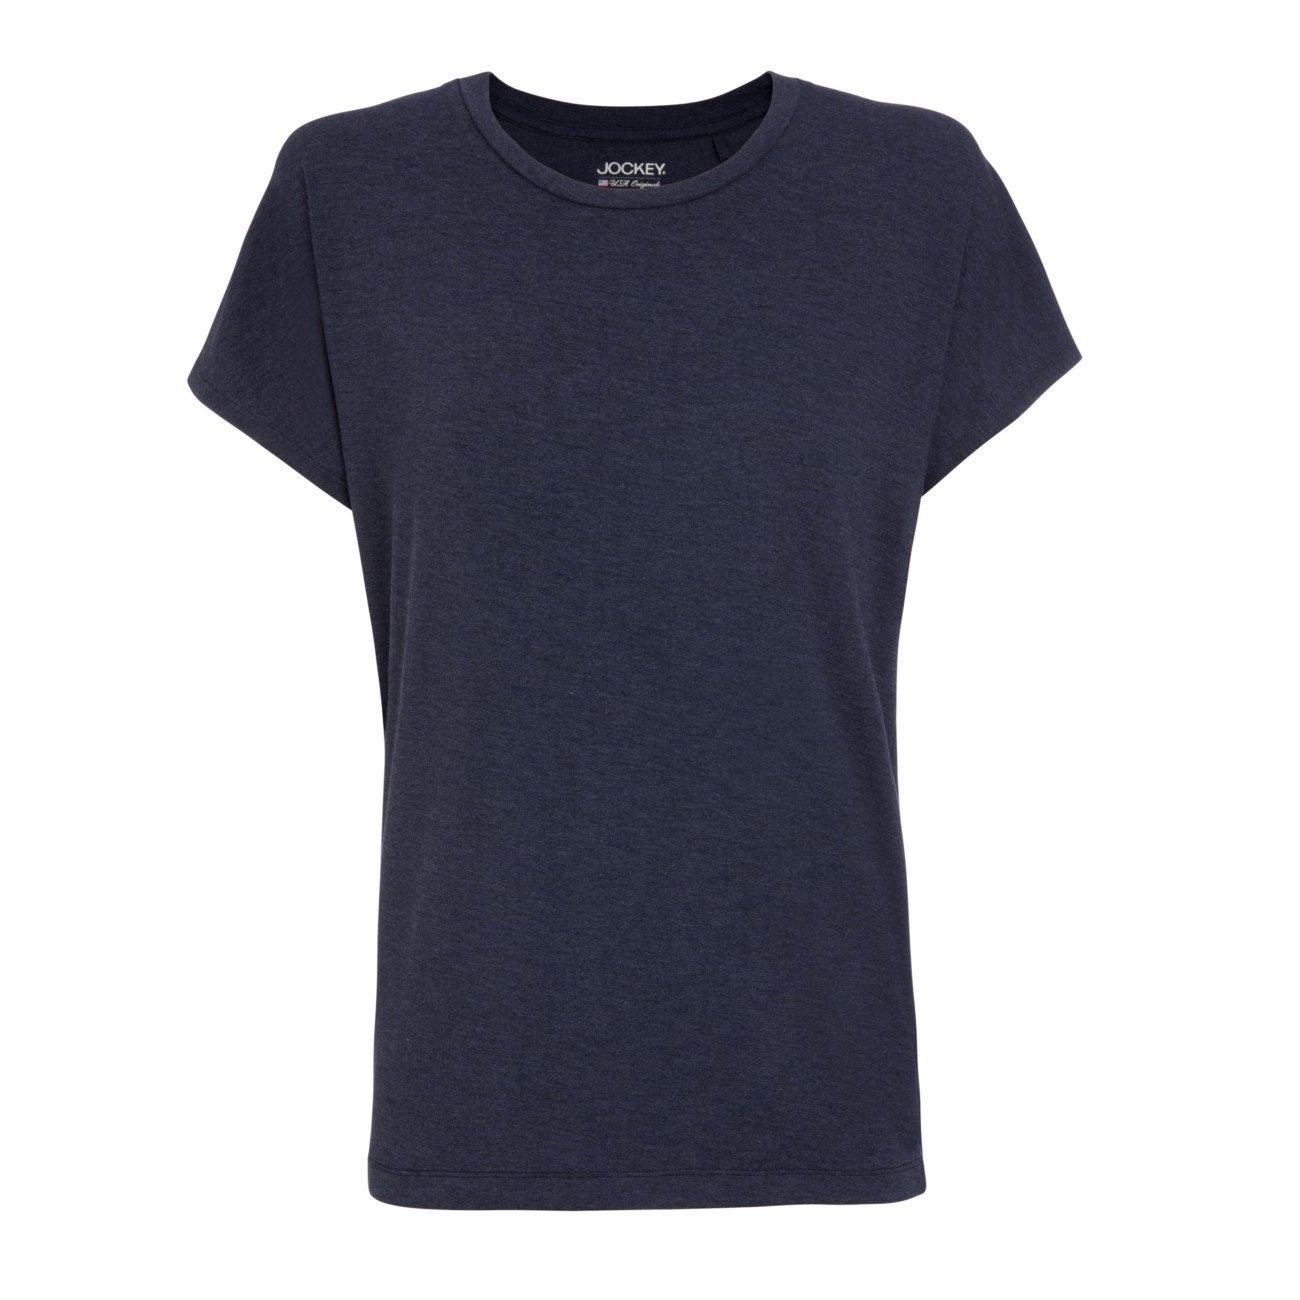 Jockey Supersoft Lounge T-Shirt Damen